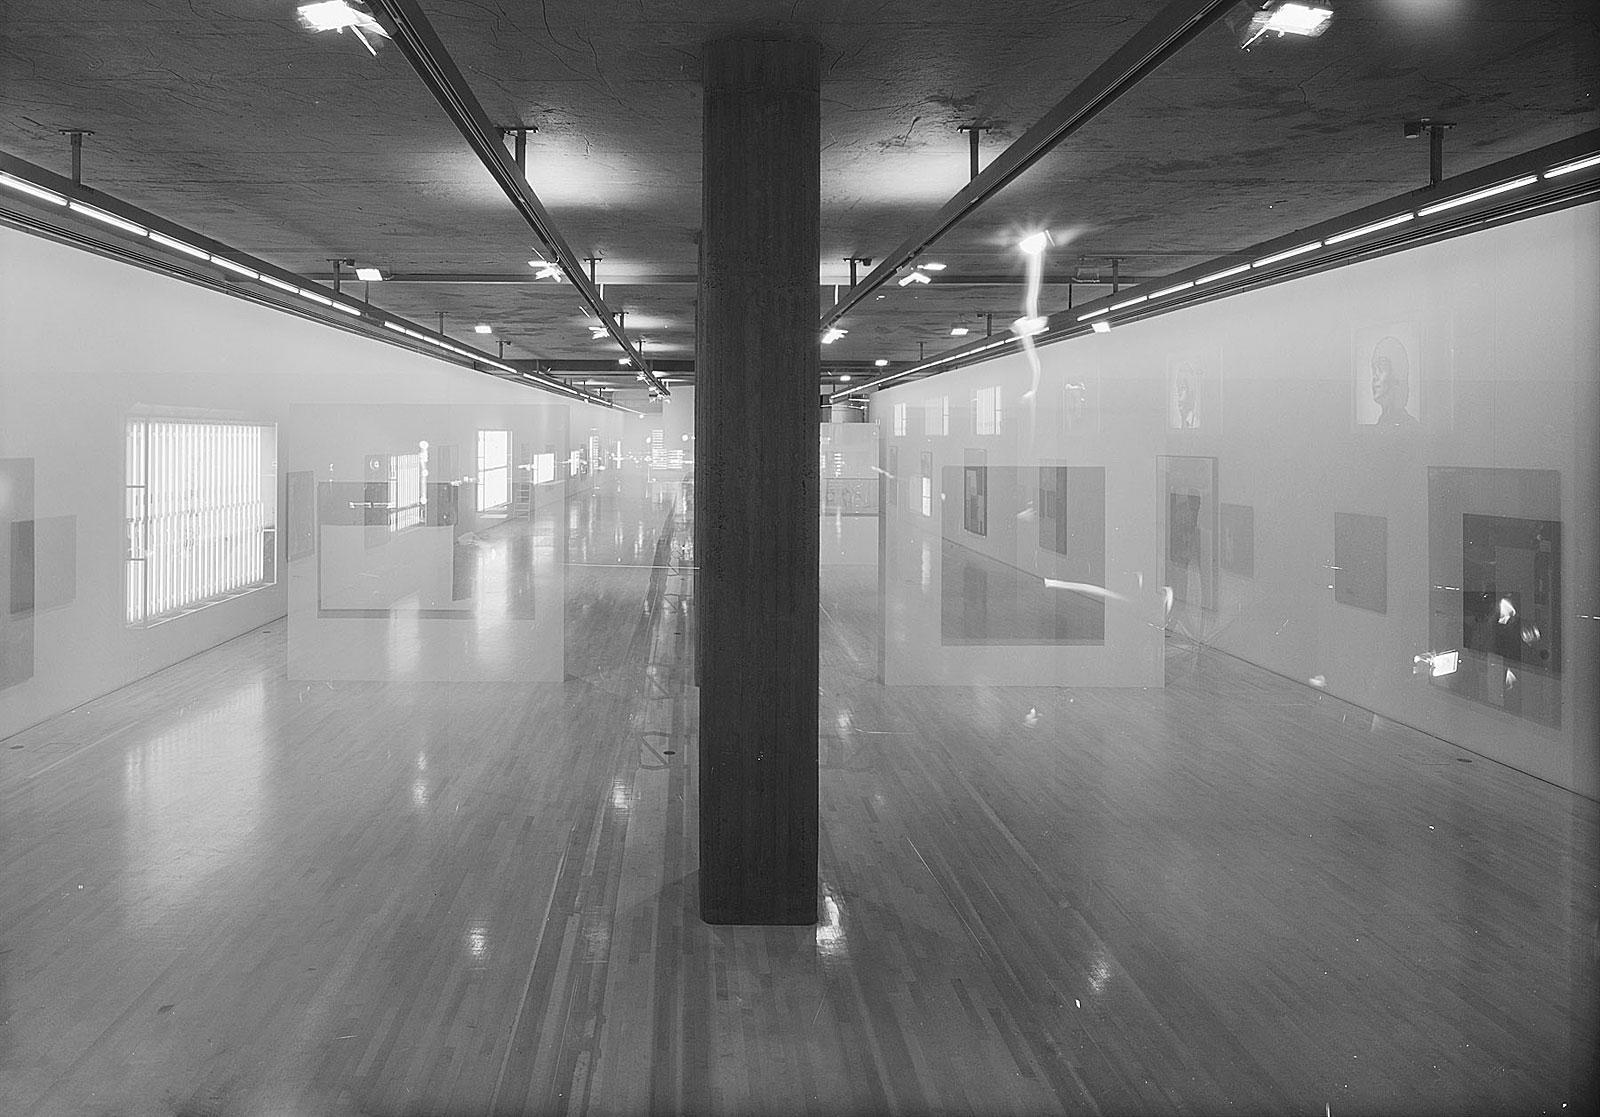 Kunstbau, Lenbachhaus München (29.7.1996 – 29.7.1997)